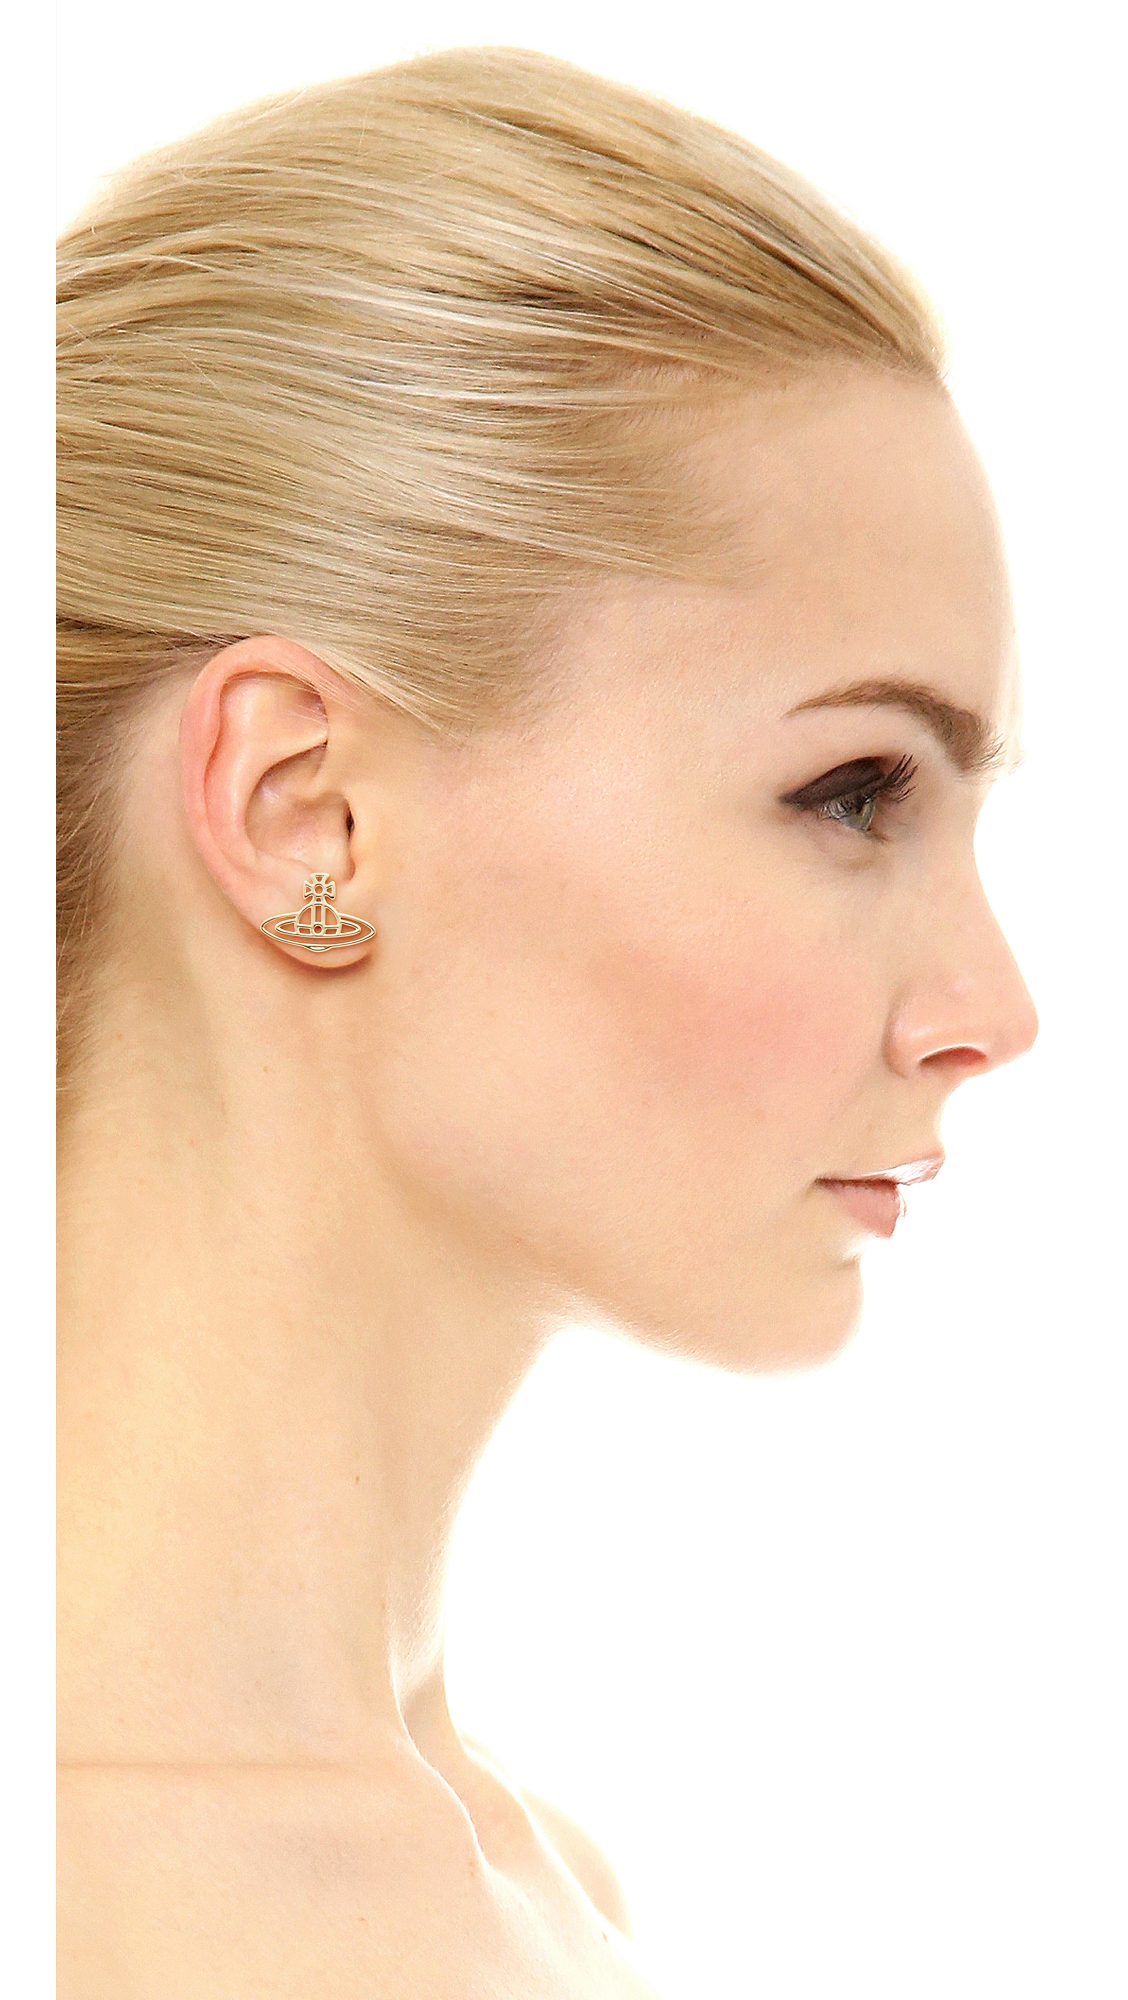 b242b2f13 Vivienne Westwood Thin Lines Flat Orb Stud Earrings | SHOPBOP